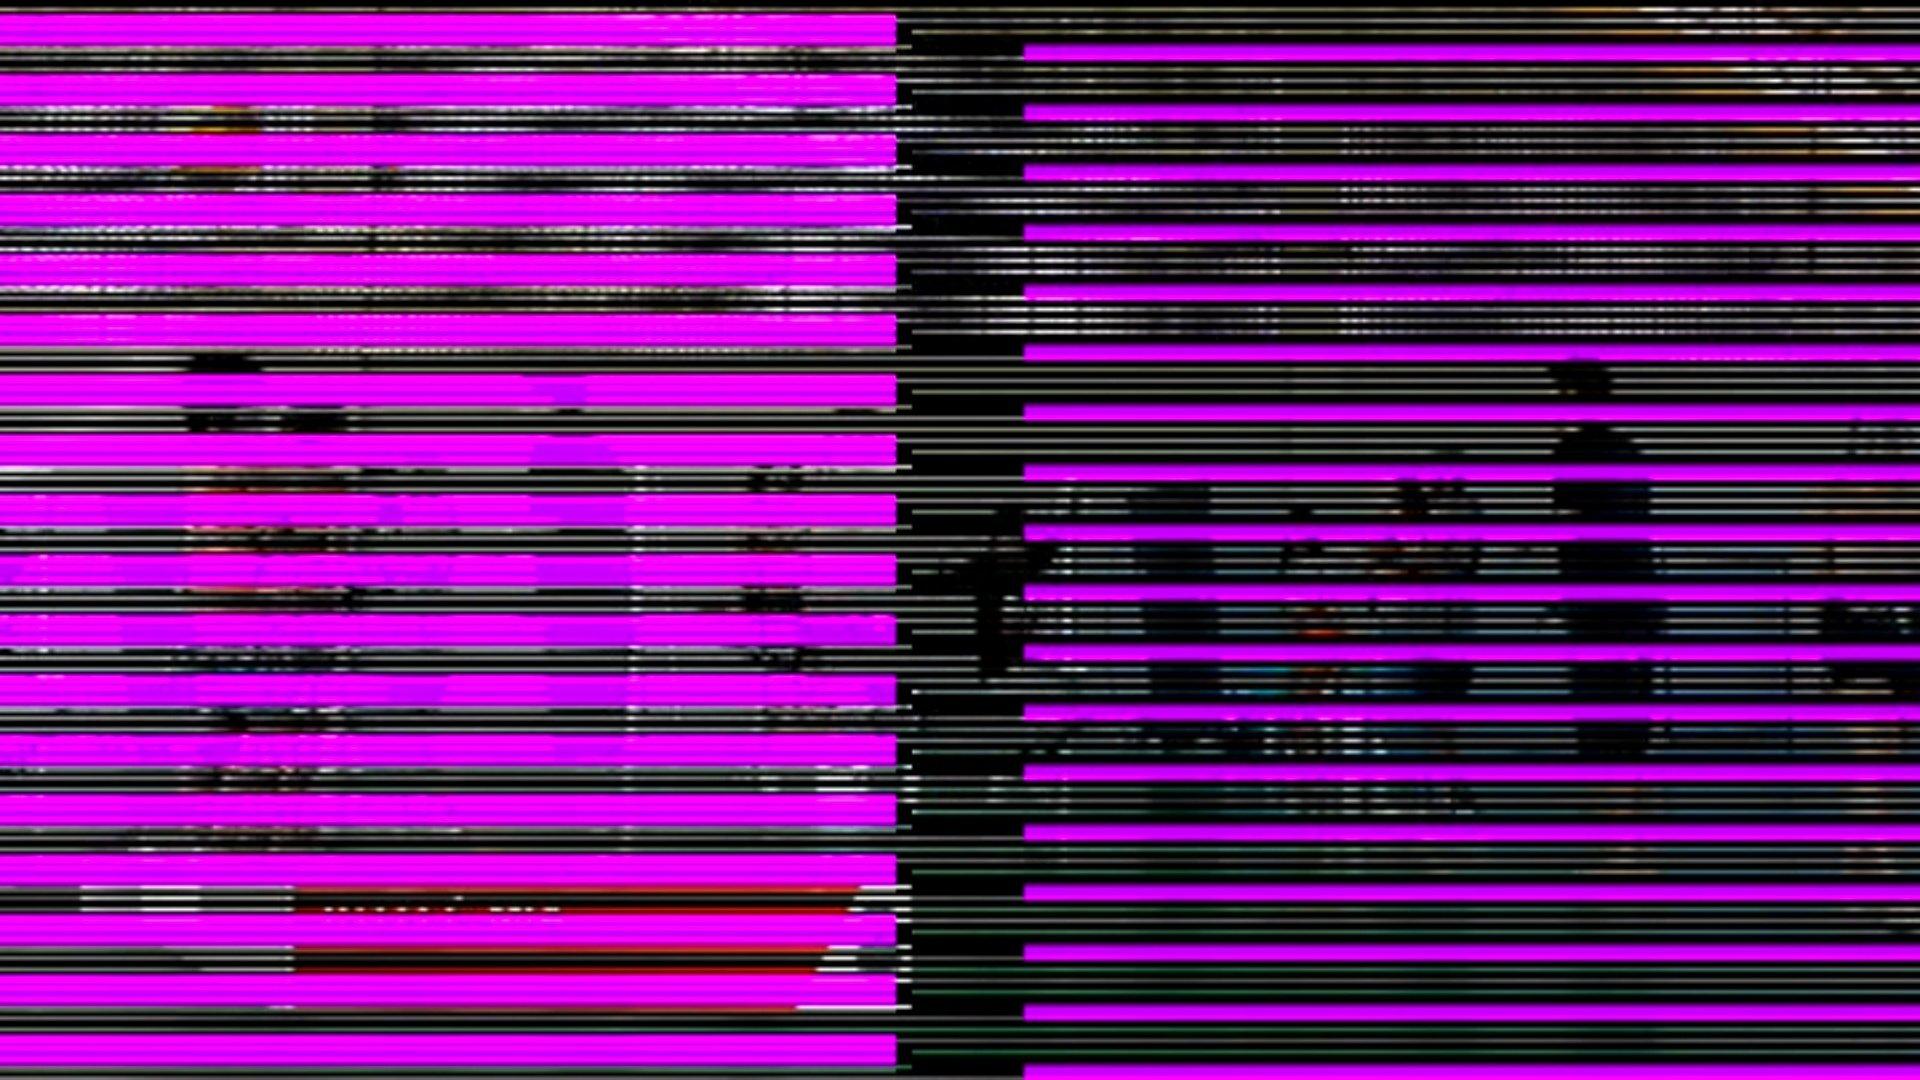 1_0_1_1_1_FFFF_64AA06_0_0_0_20190126154823.jpg.cd8fcf5d51c87030ed5f872a23d03aa9.jpg